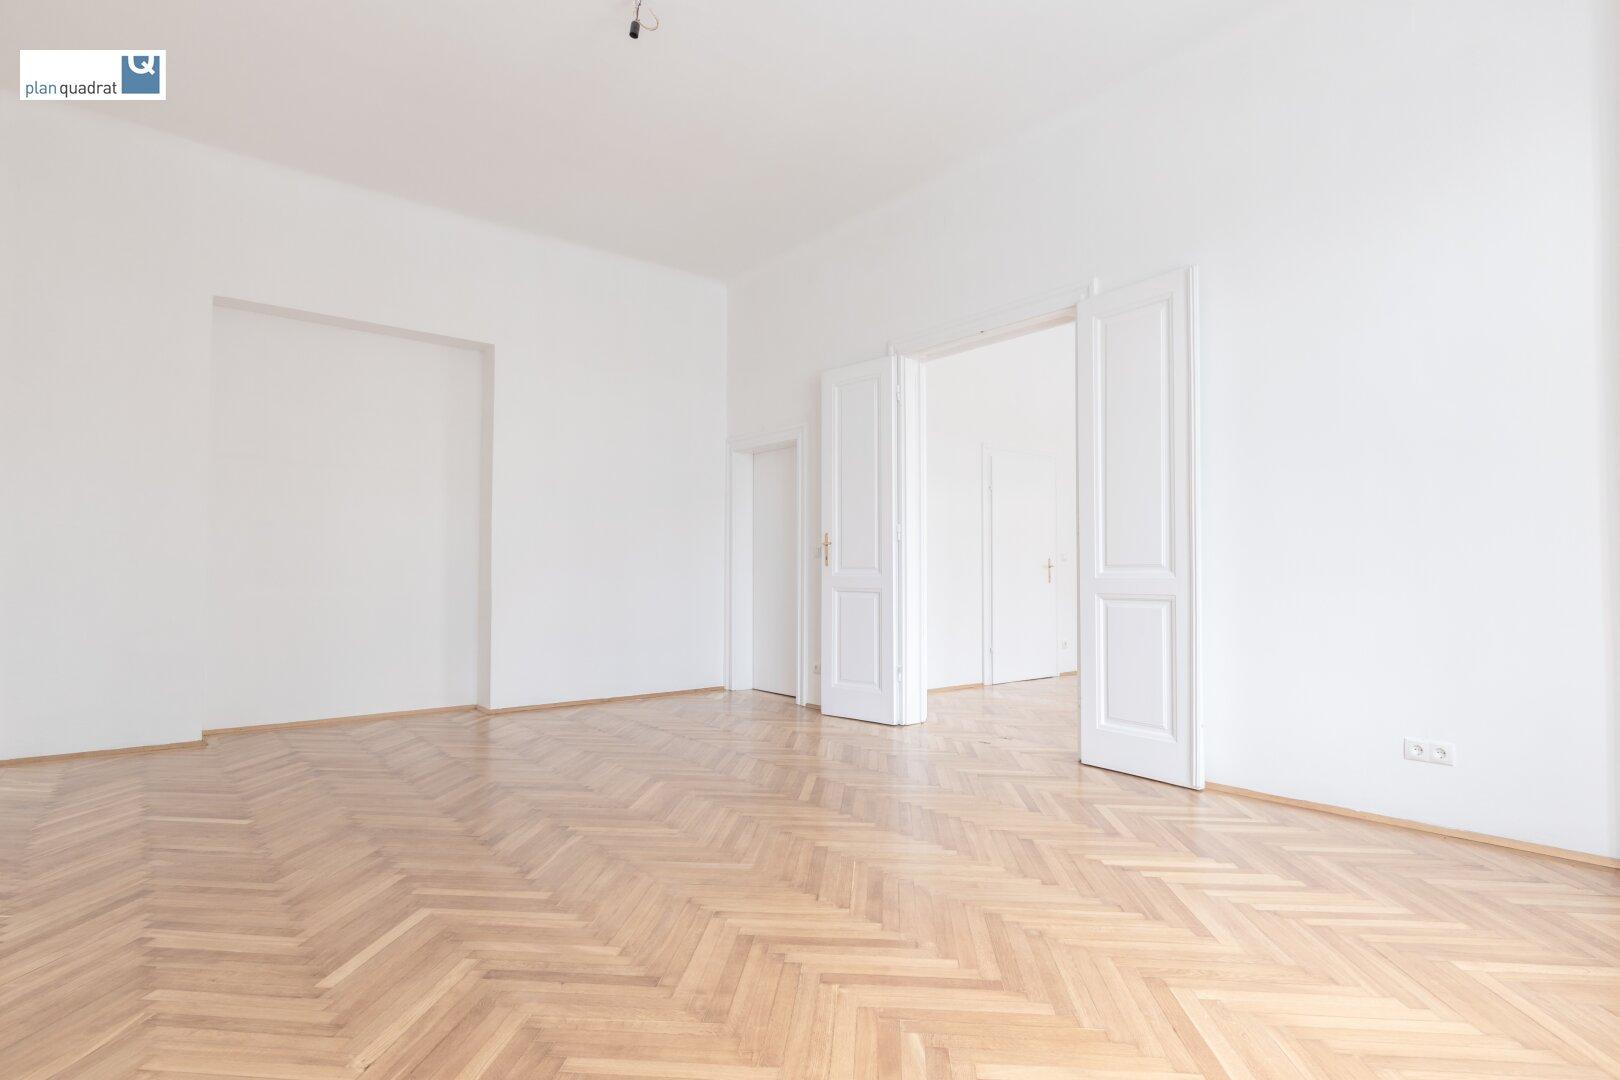 Zimmer 1 (gem. Plan; ca. 27,75 qm)